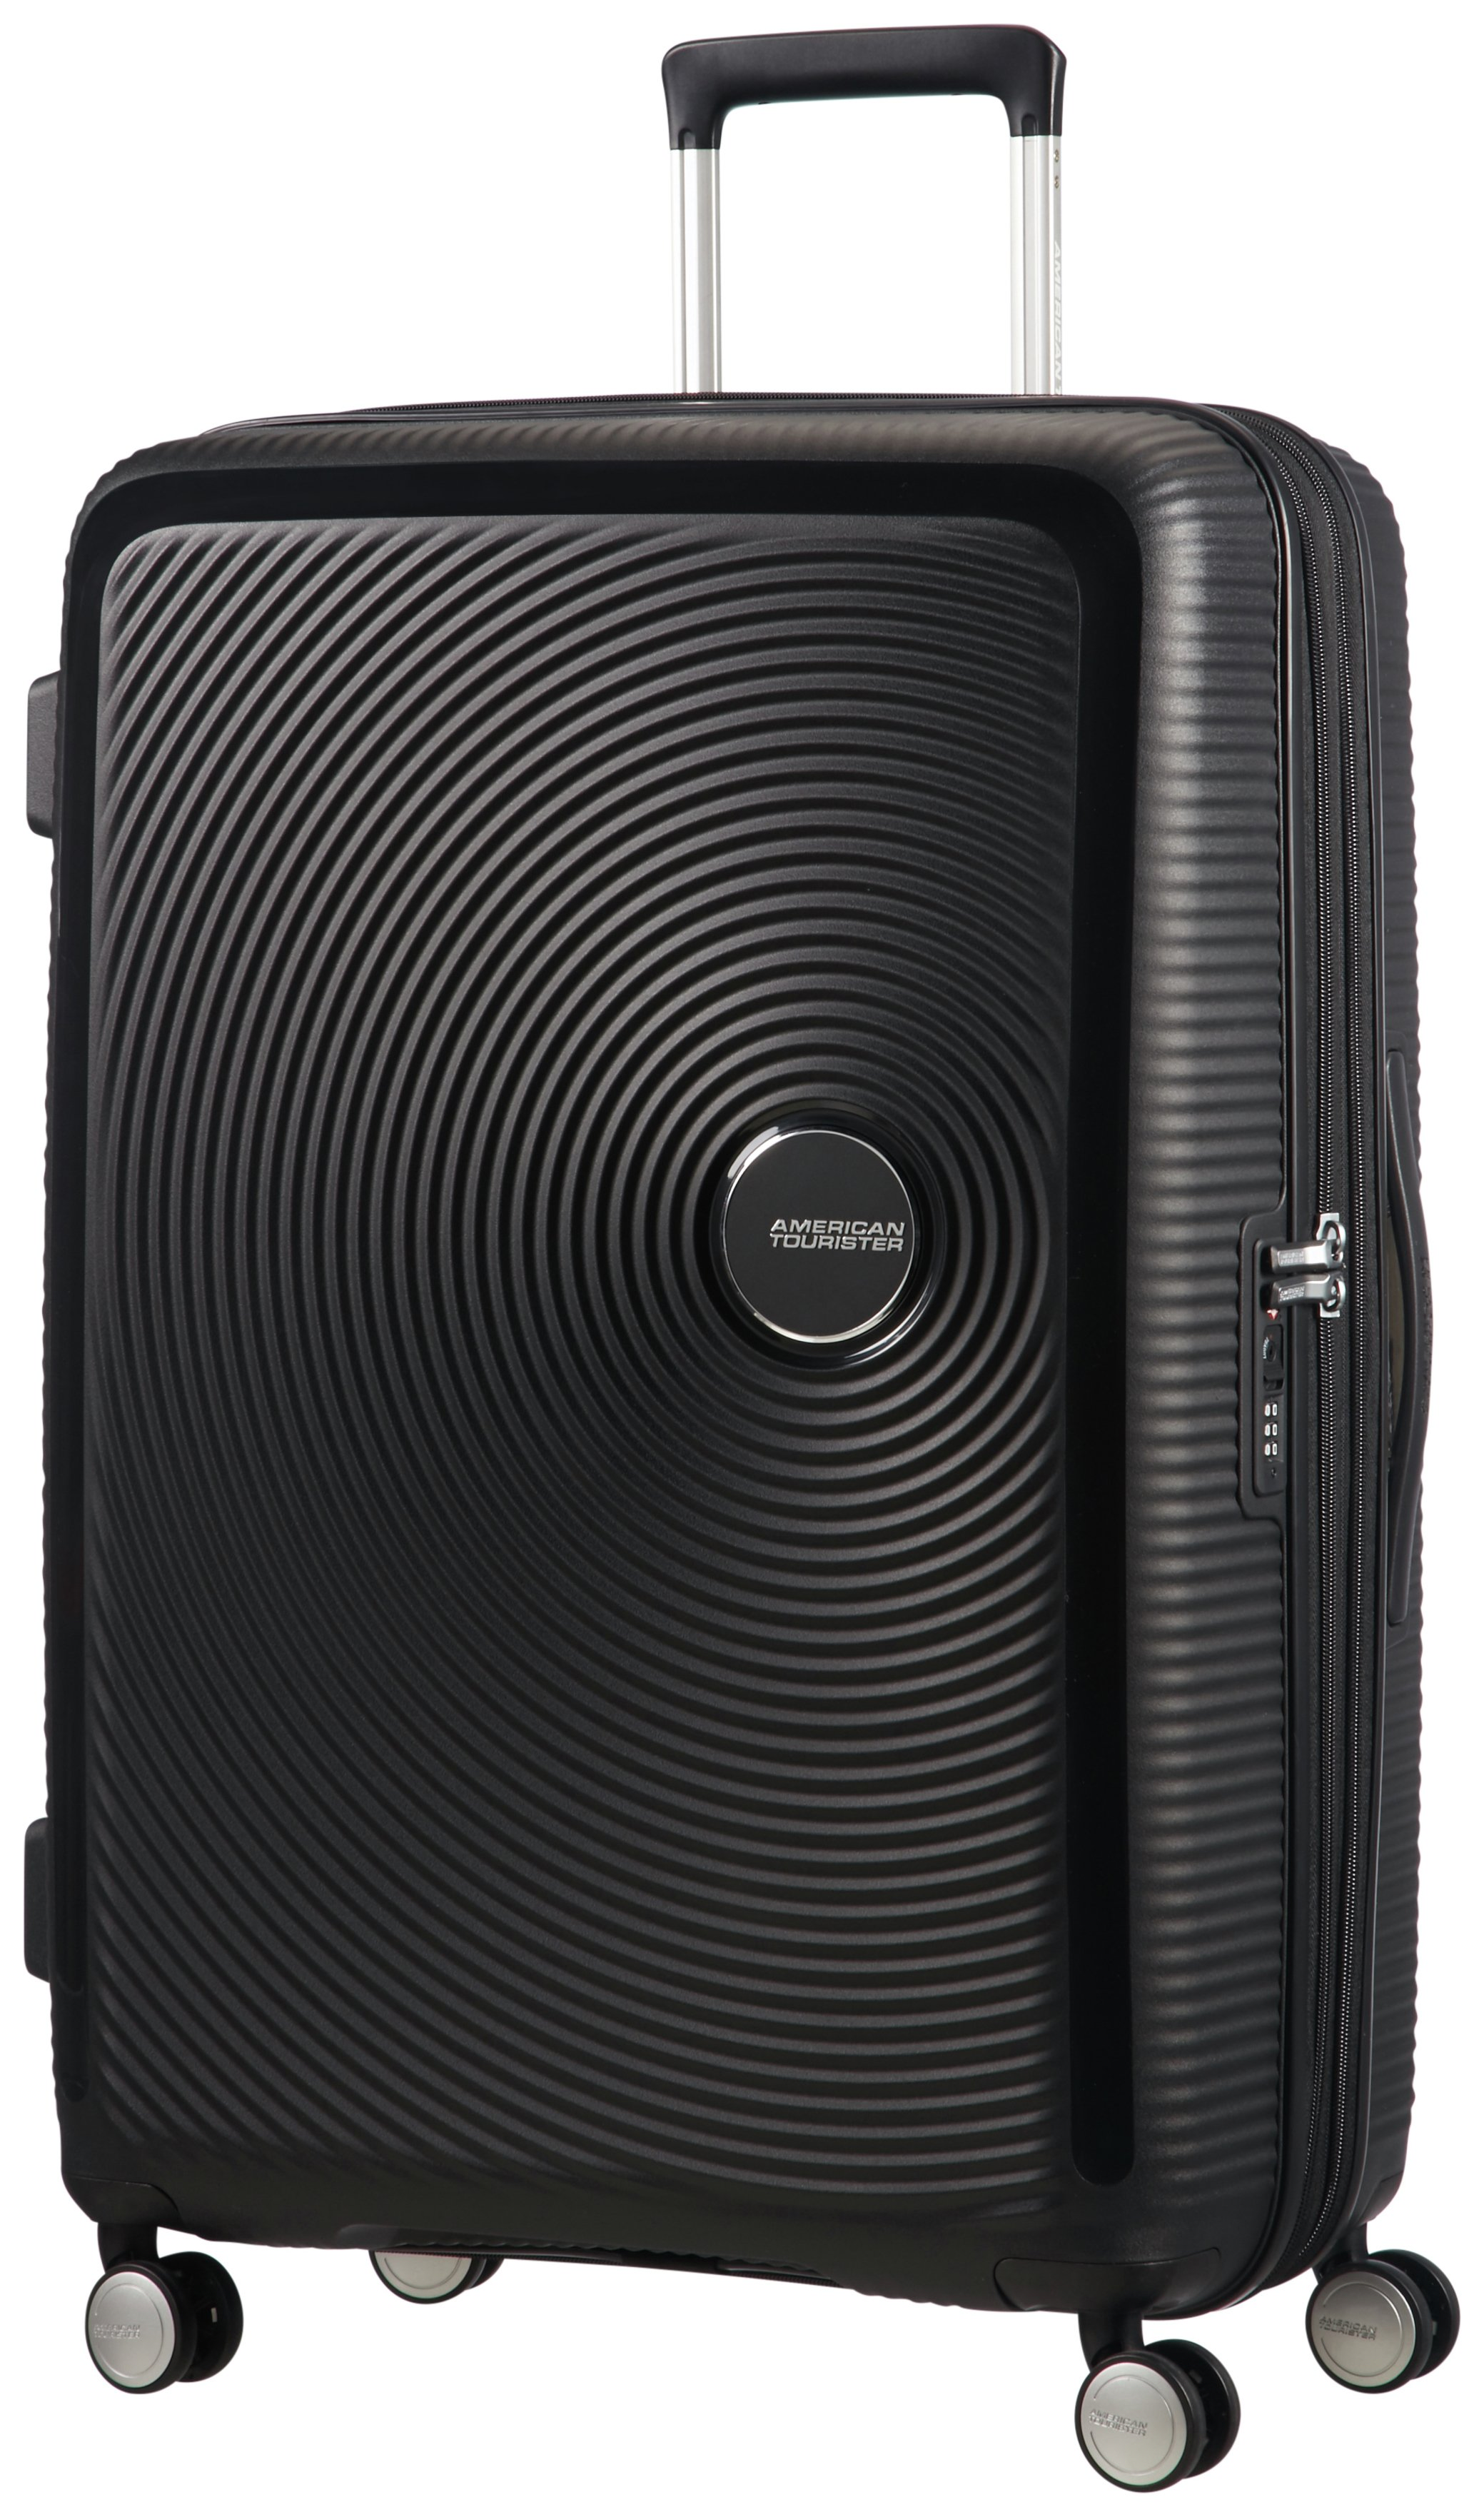 American Tourister Soundbox 8 Wheel Spinner 77 - Bass Black